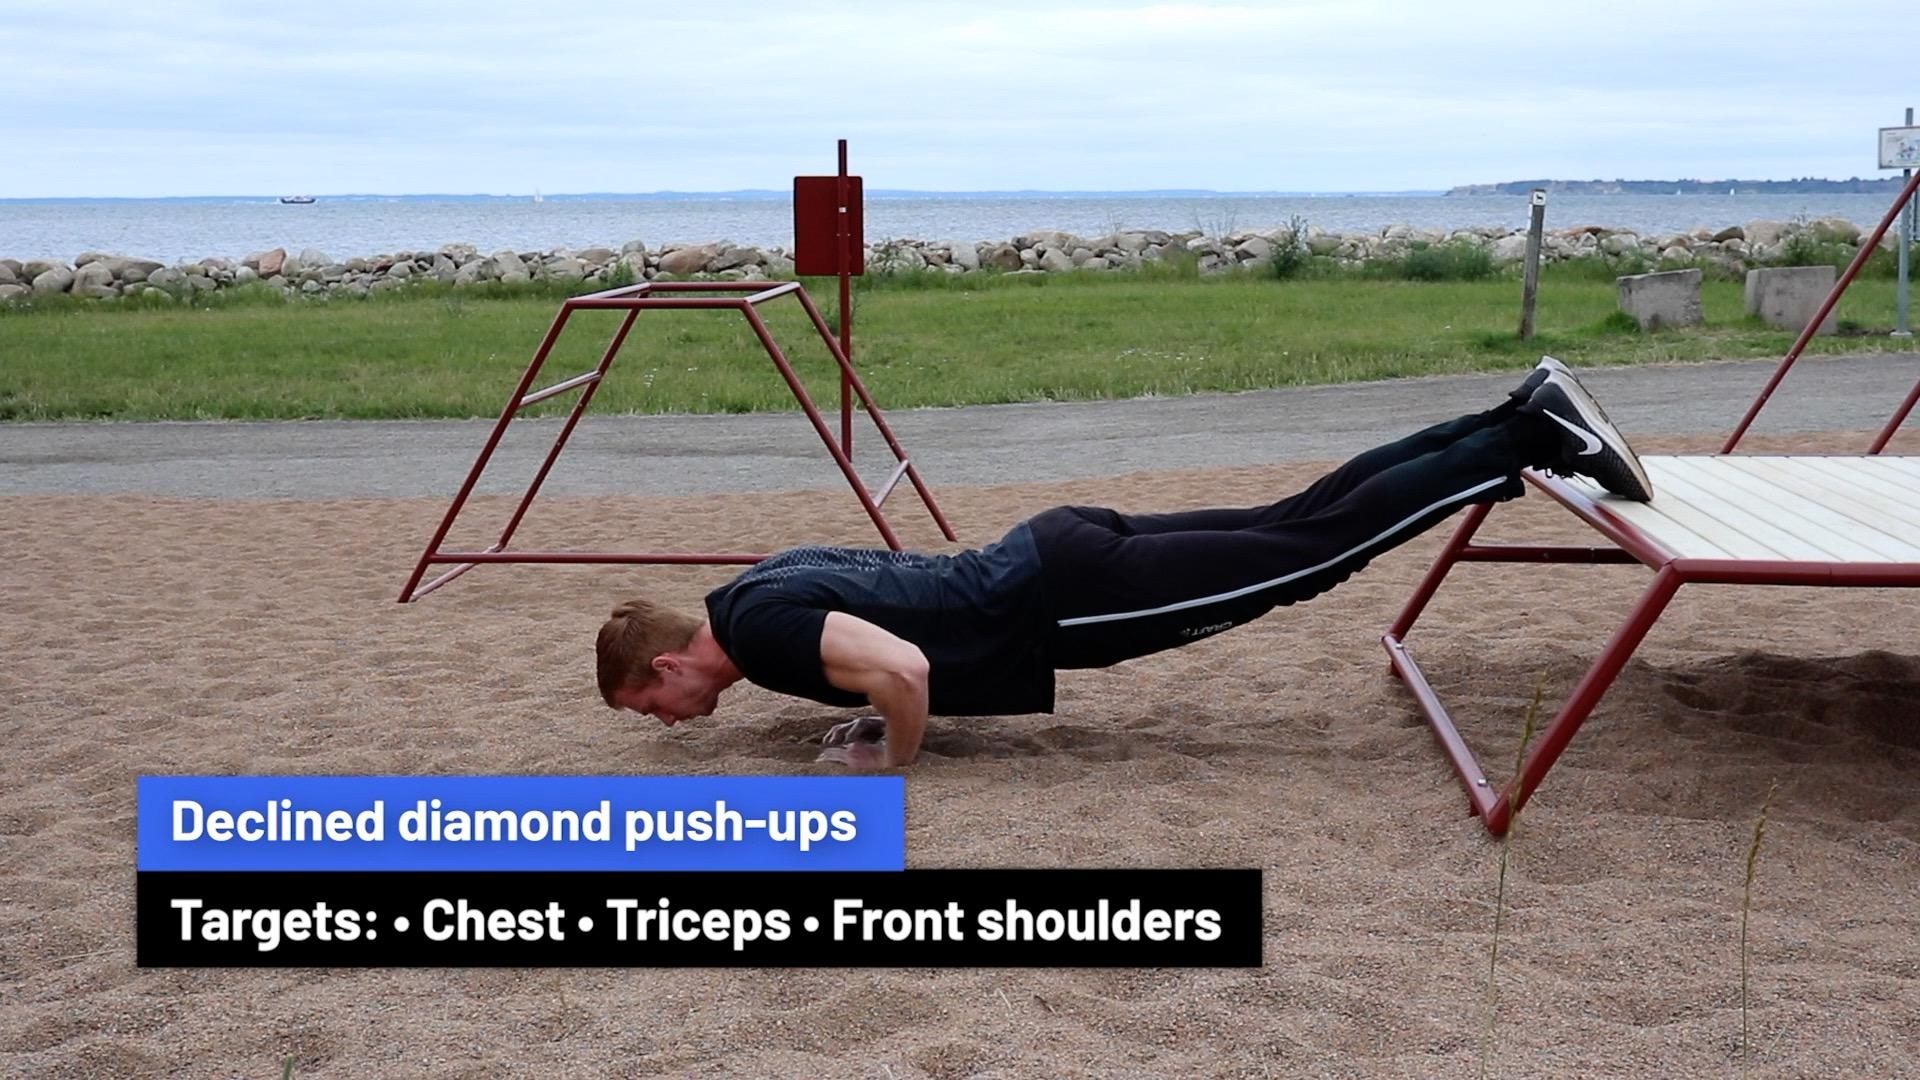 Declined diamond push-ups